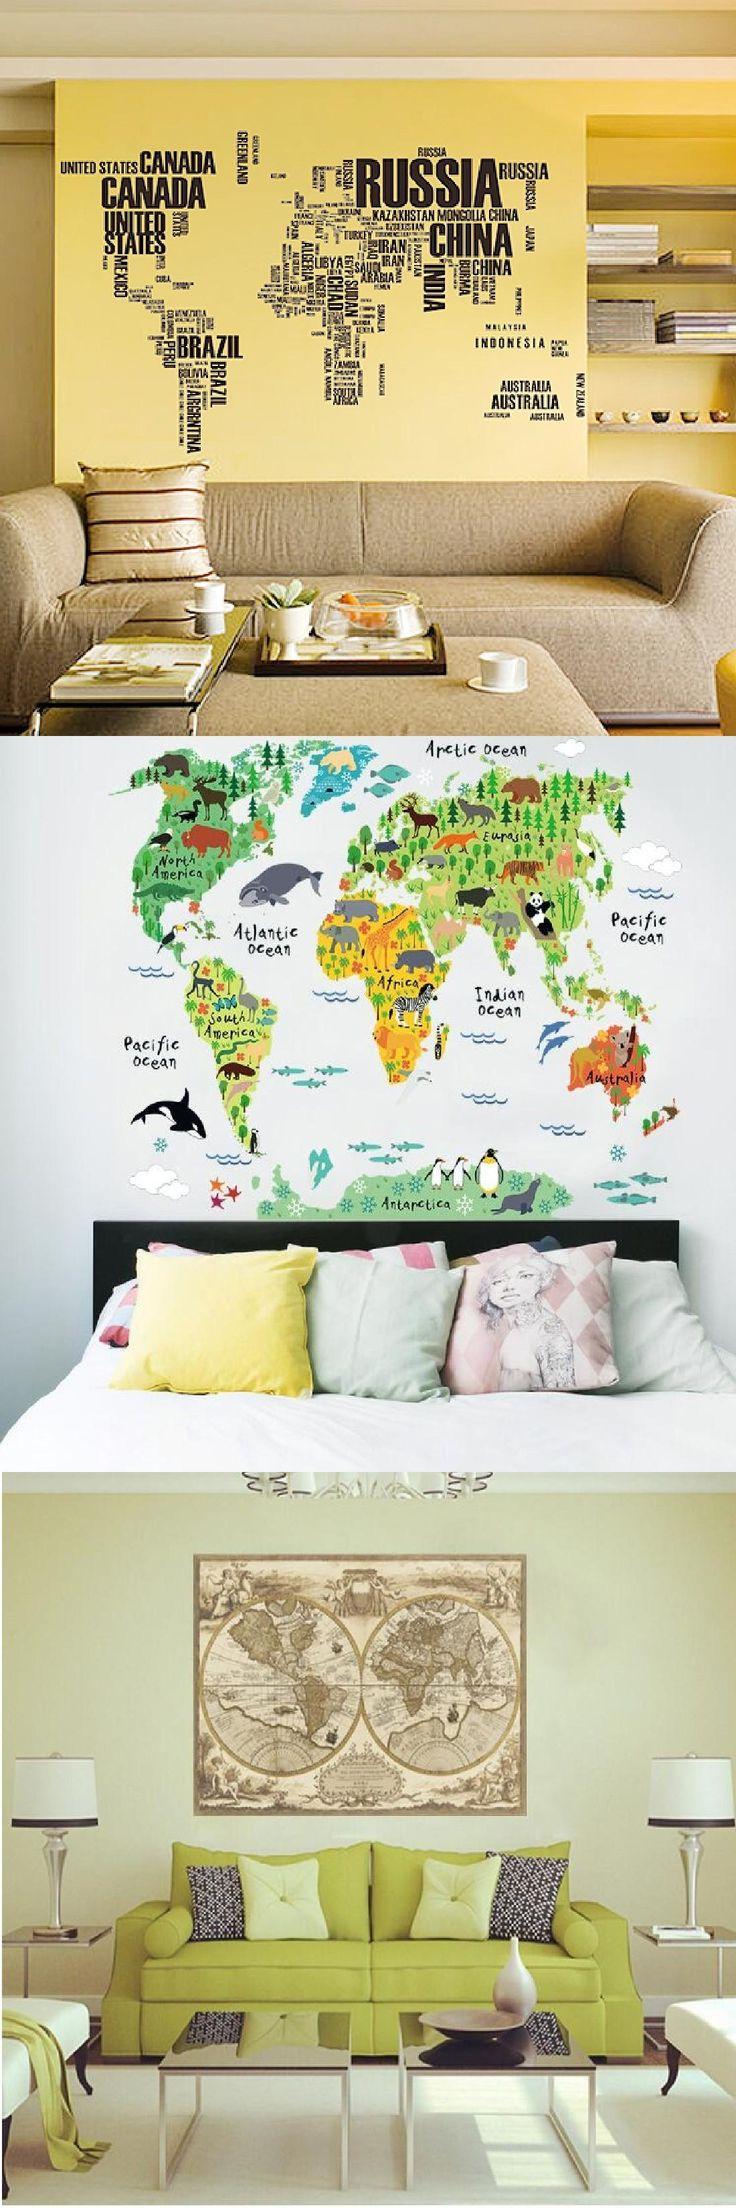 Best  Promotional Stickers Ideas On Pinterest Best Business - Promotional custom vinyl stickers australia